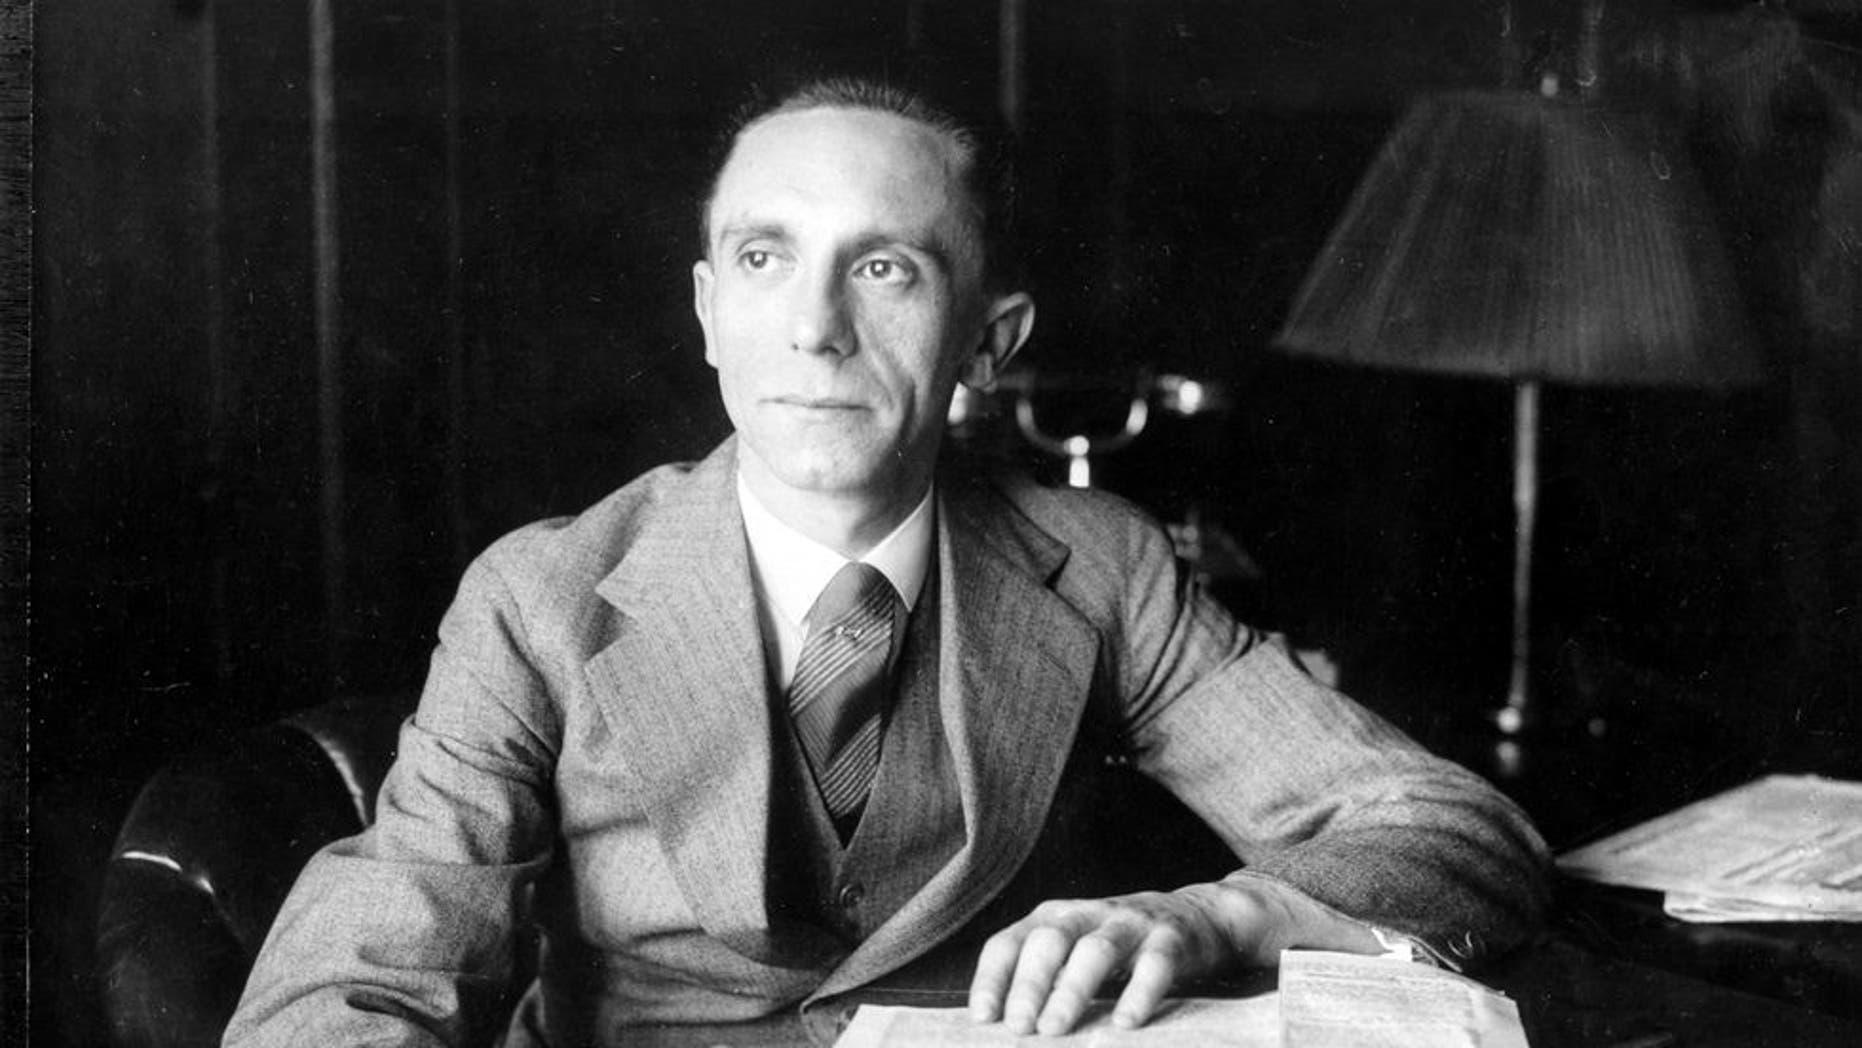 Joseph Goebbels in the 1930s.